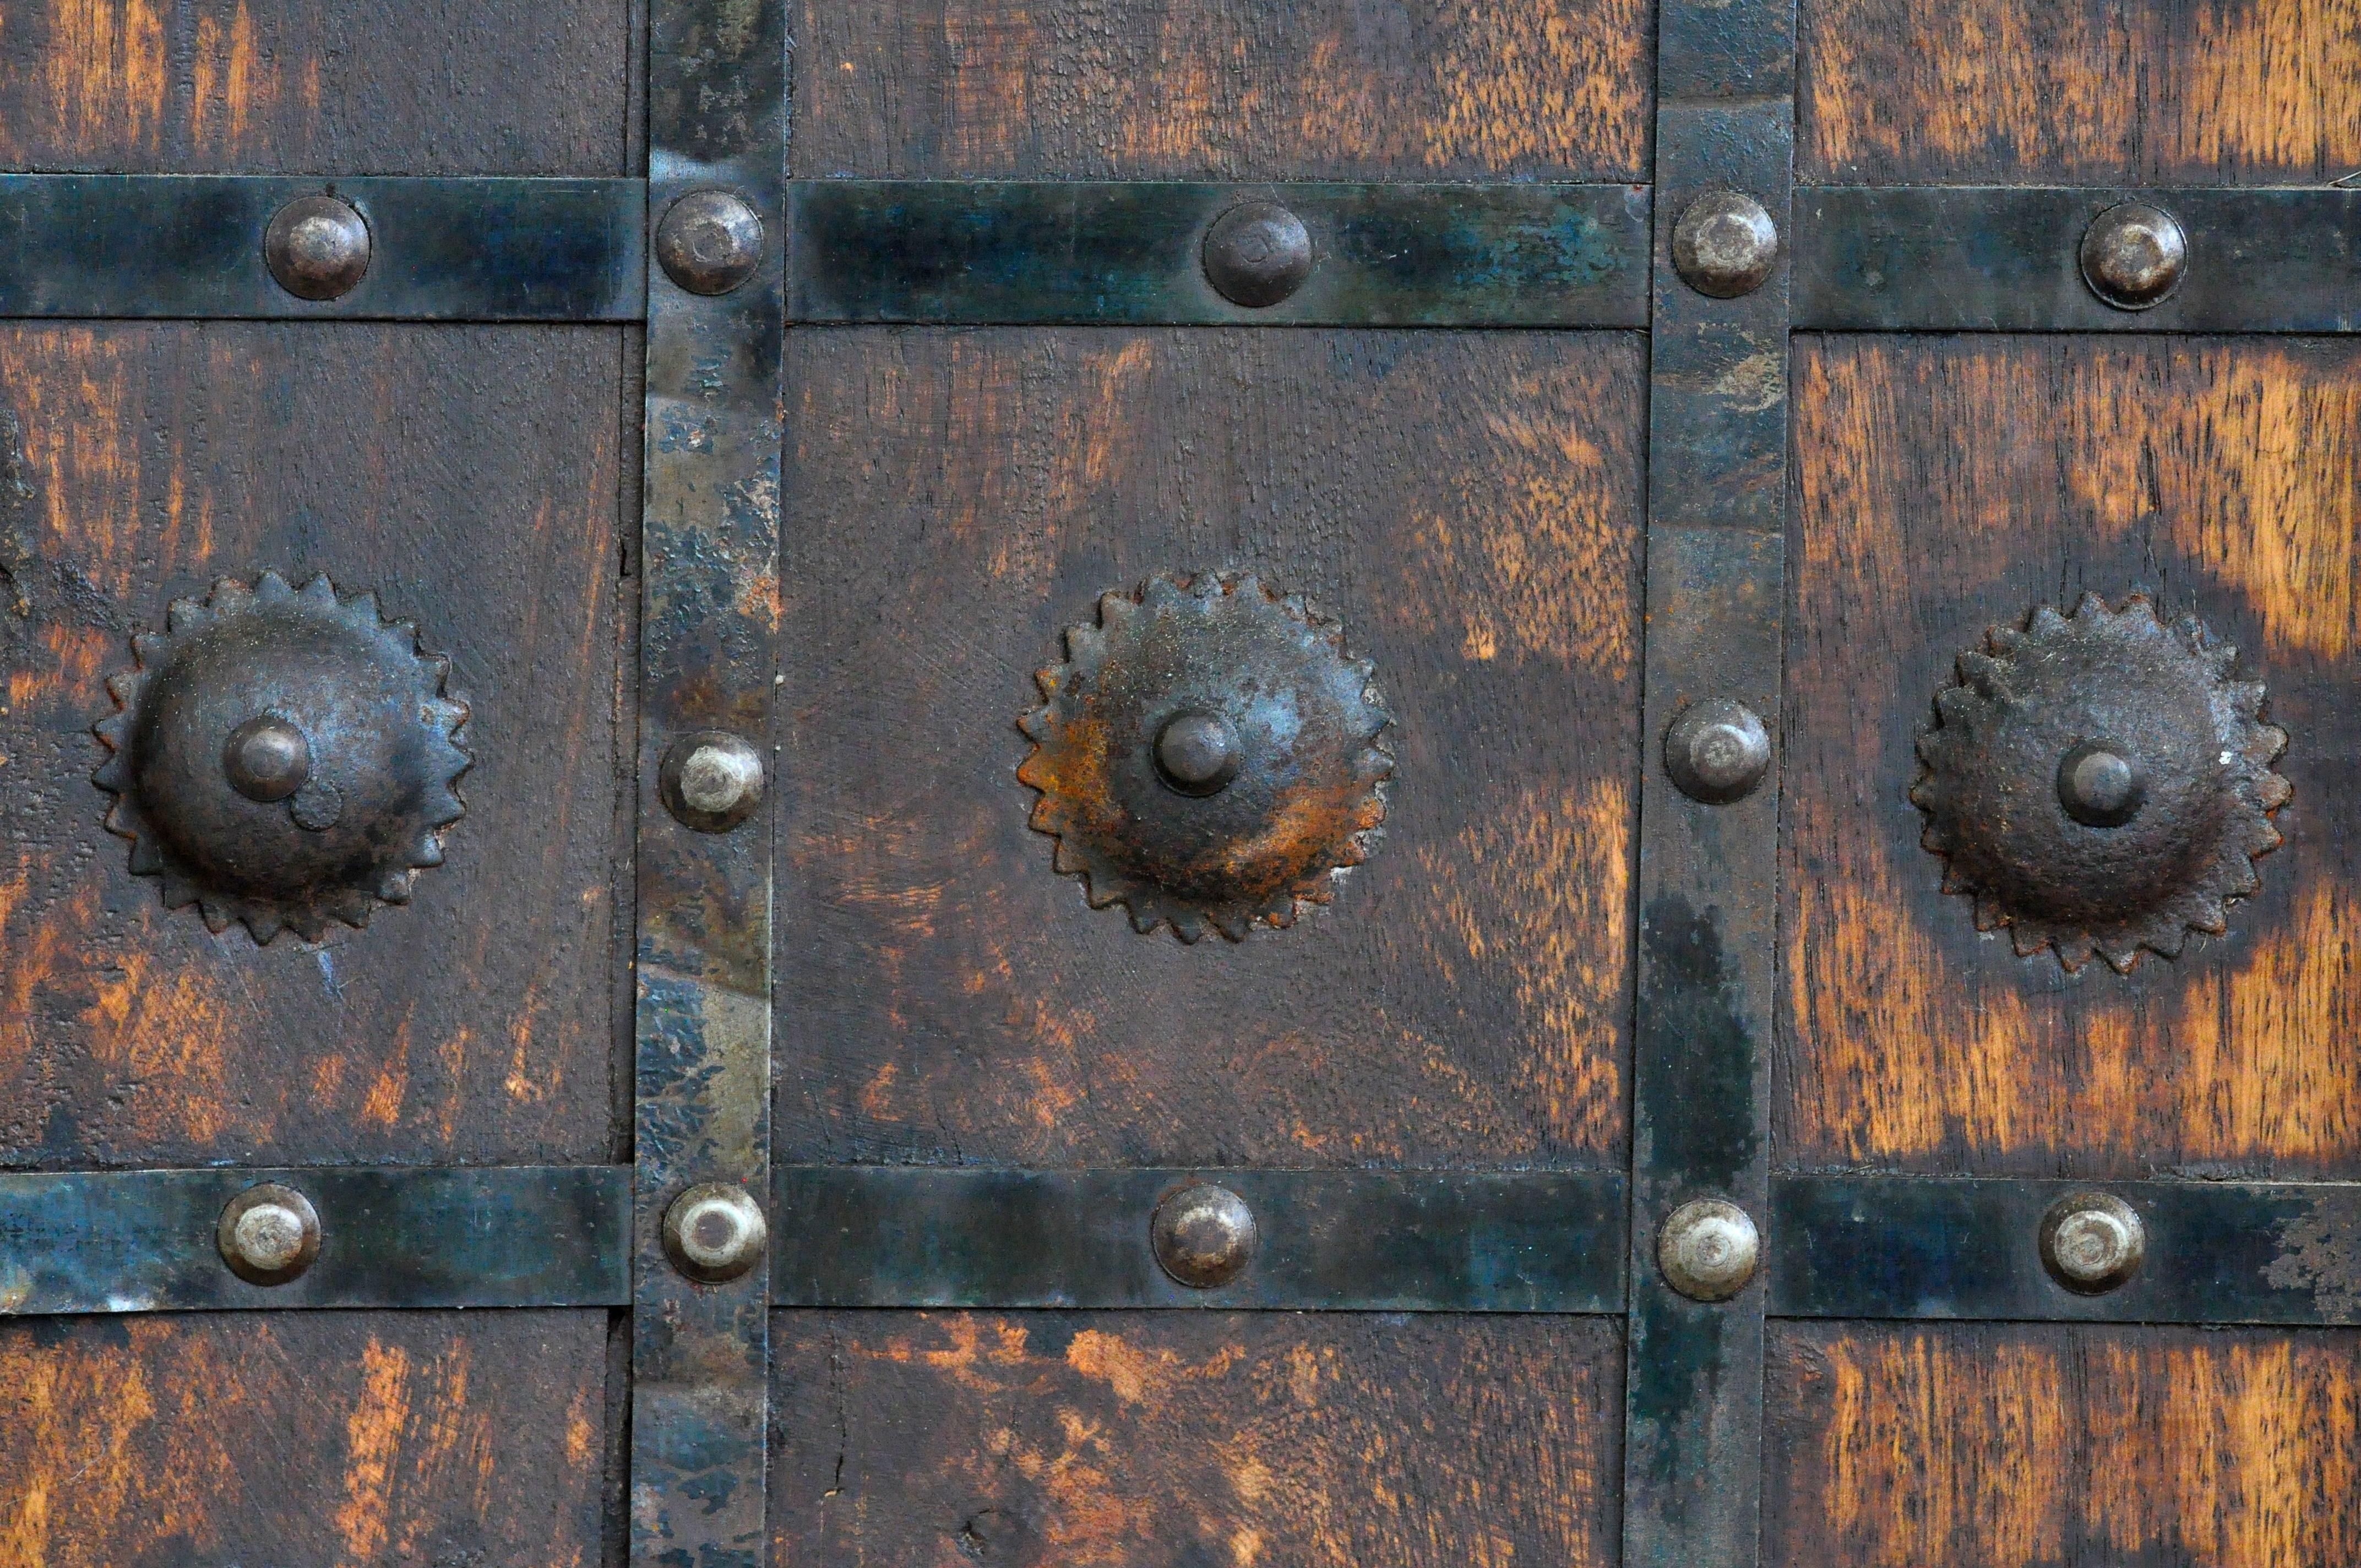 Fotos Gratis Madera Antiguo Textura Moho Metal Mueble  # Moho Muebles Madera